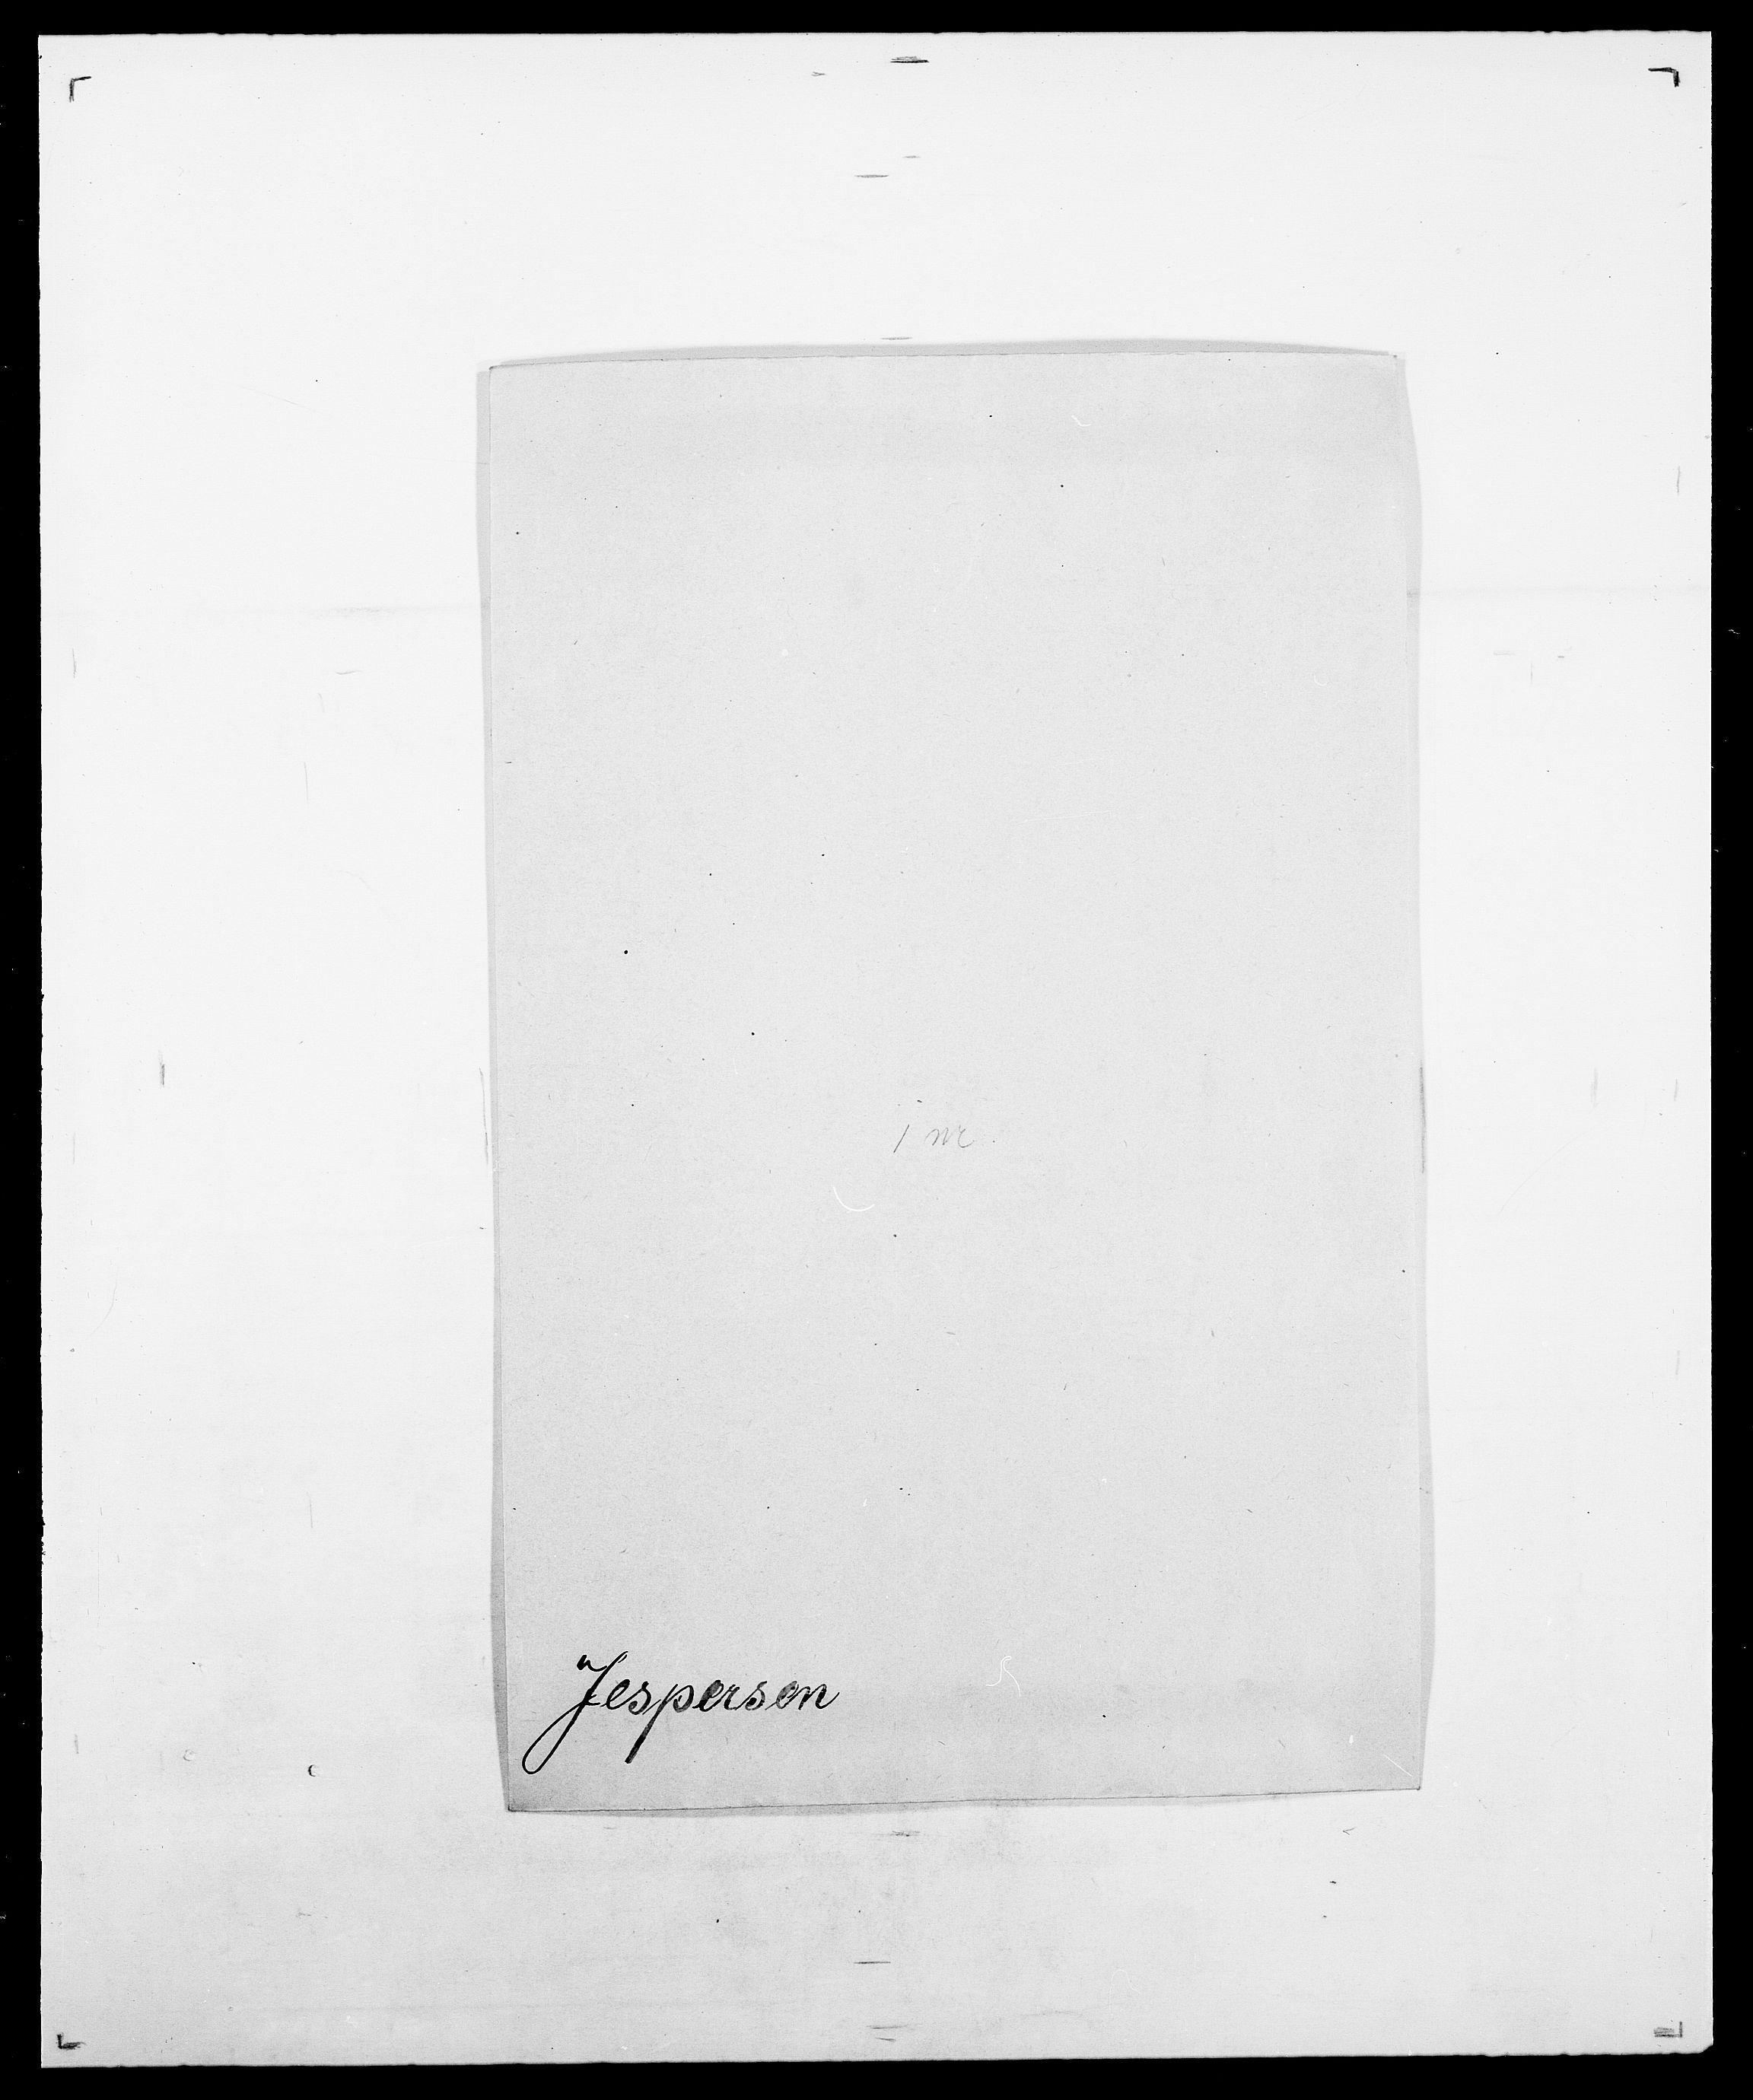 SAO, Delgobe, Charles Antoine - samling, D/Da/L0019: van der Hude - Joys, s. 722